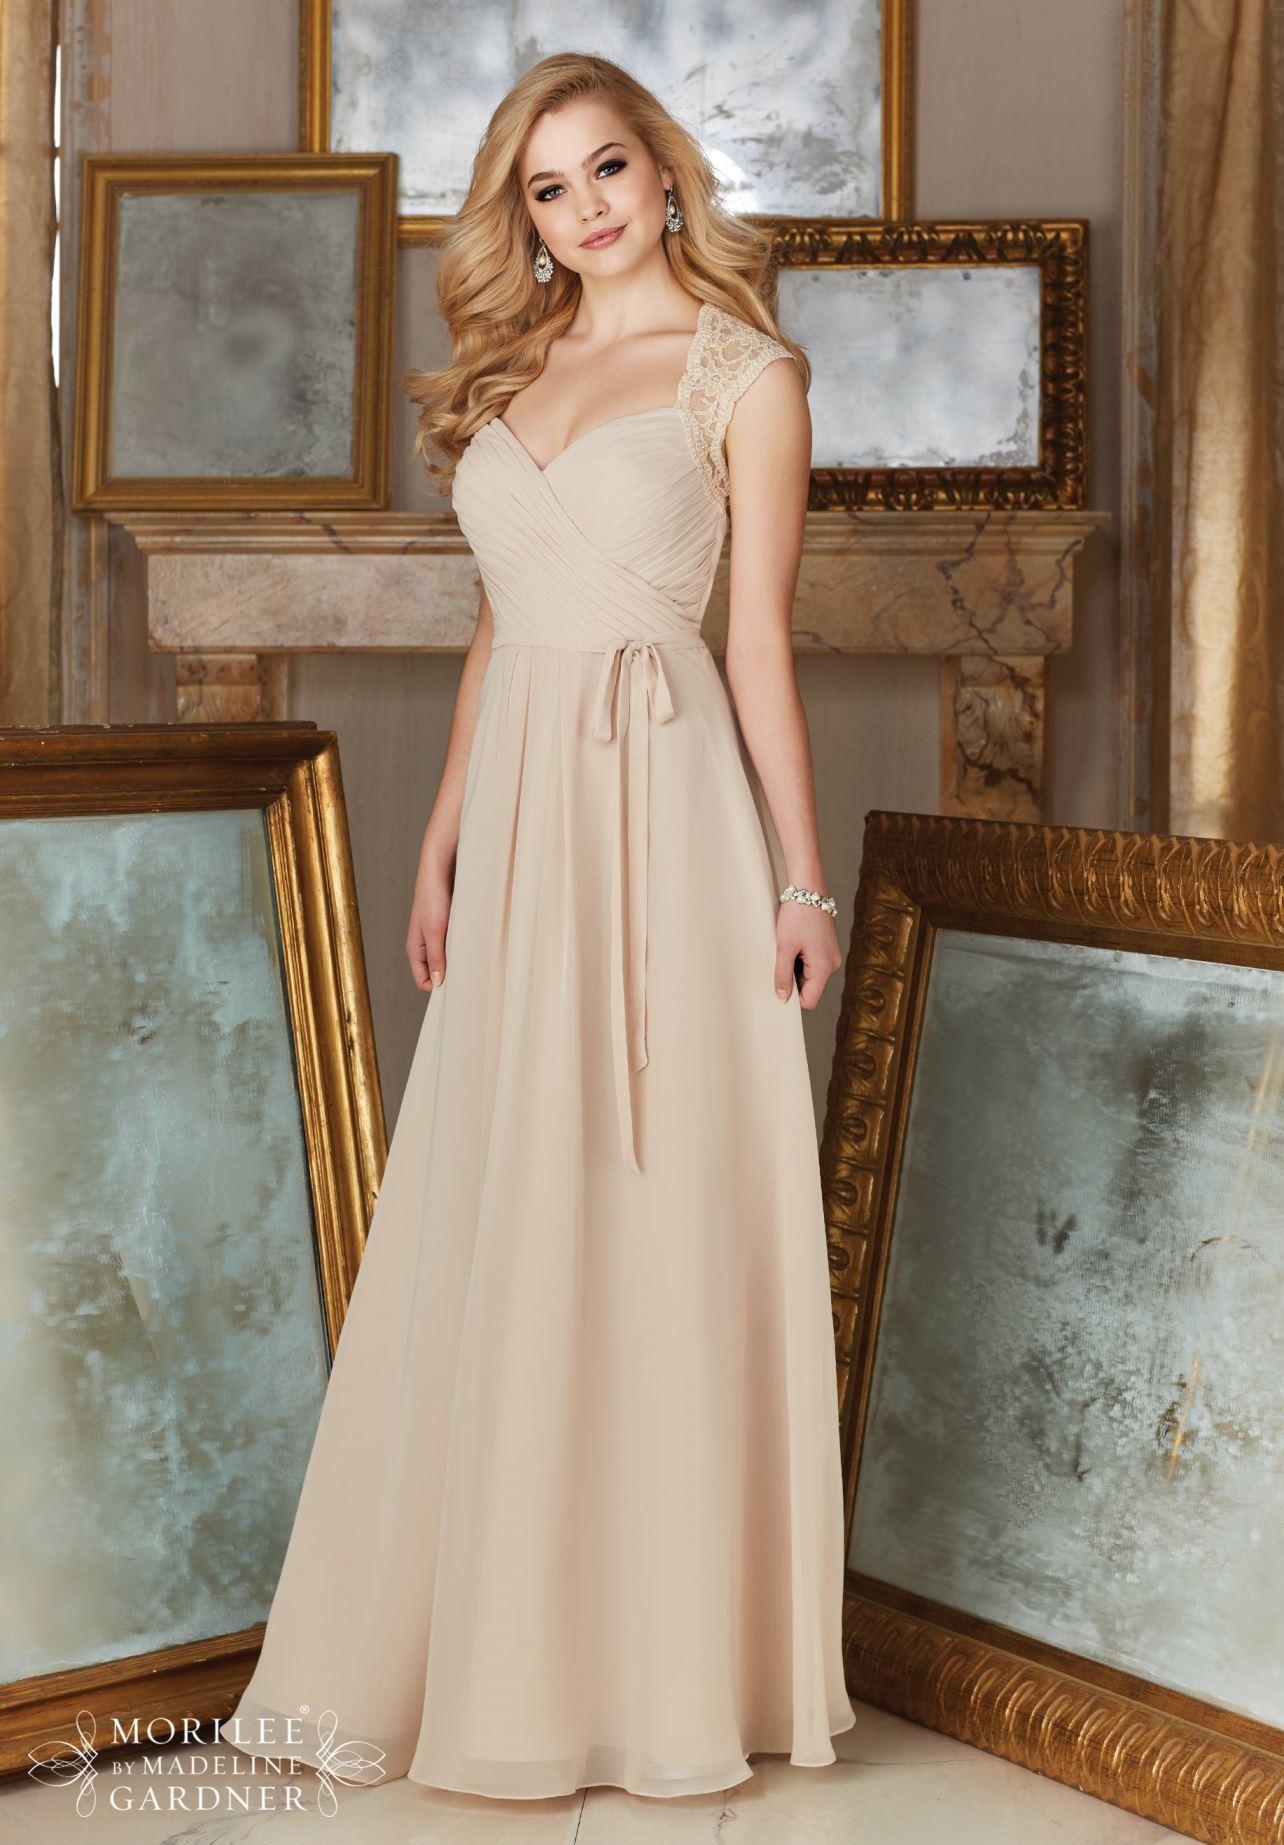 Dress mori lee bridesmaids fall 2016 collection 145 for Mori lee wedding dress price